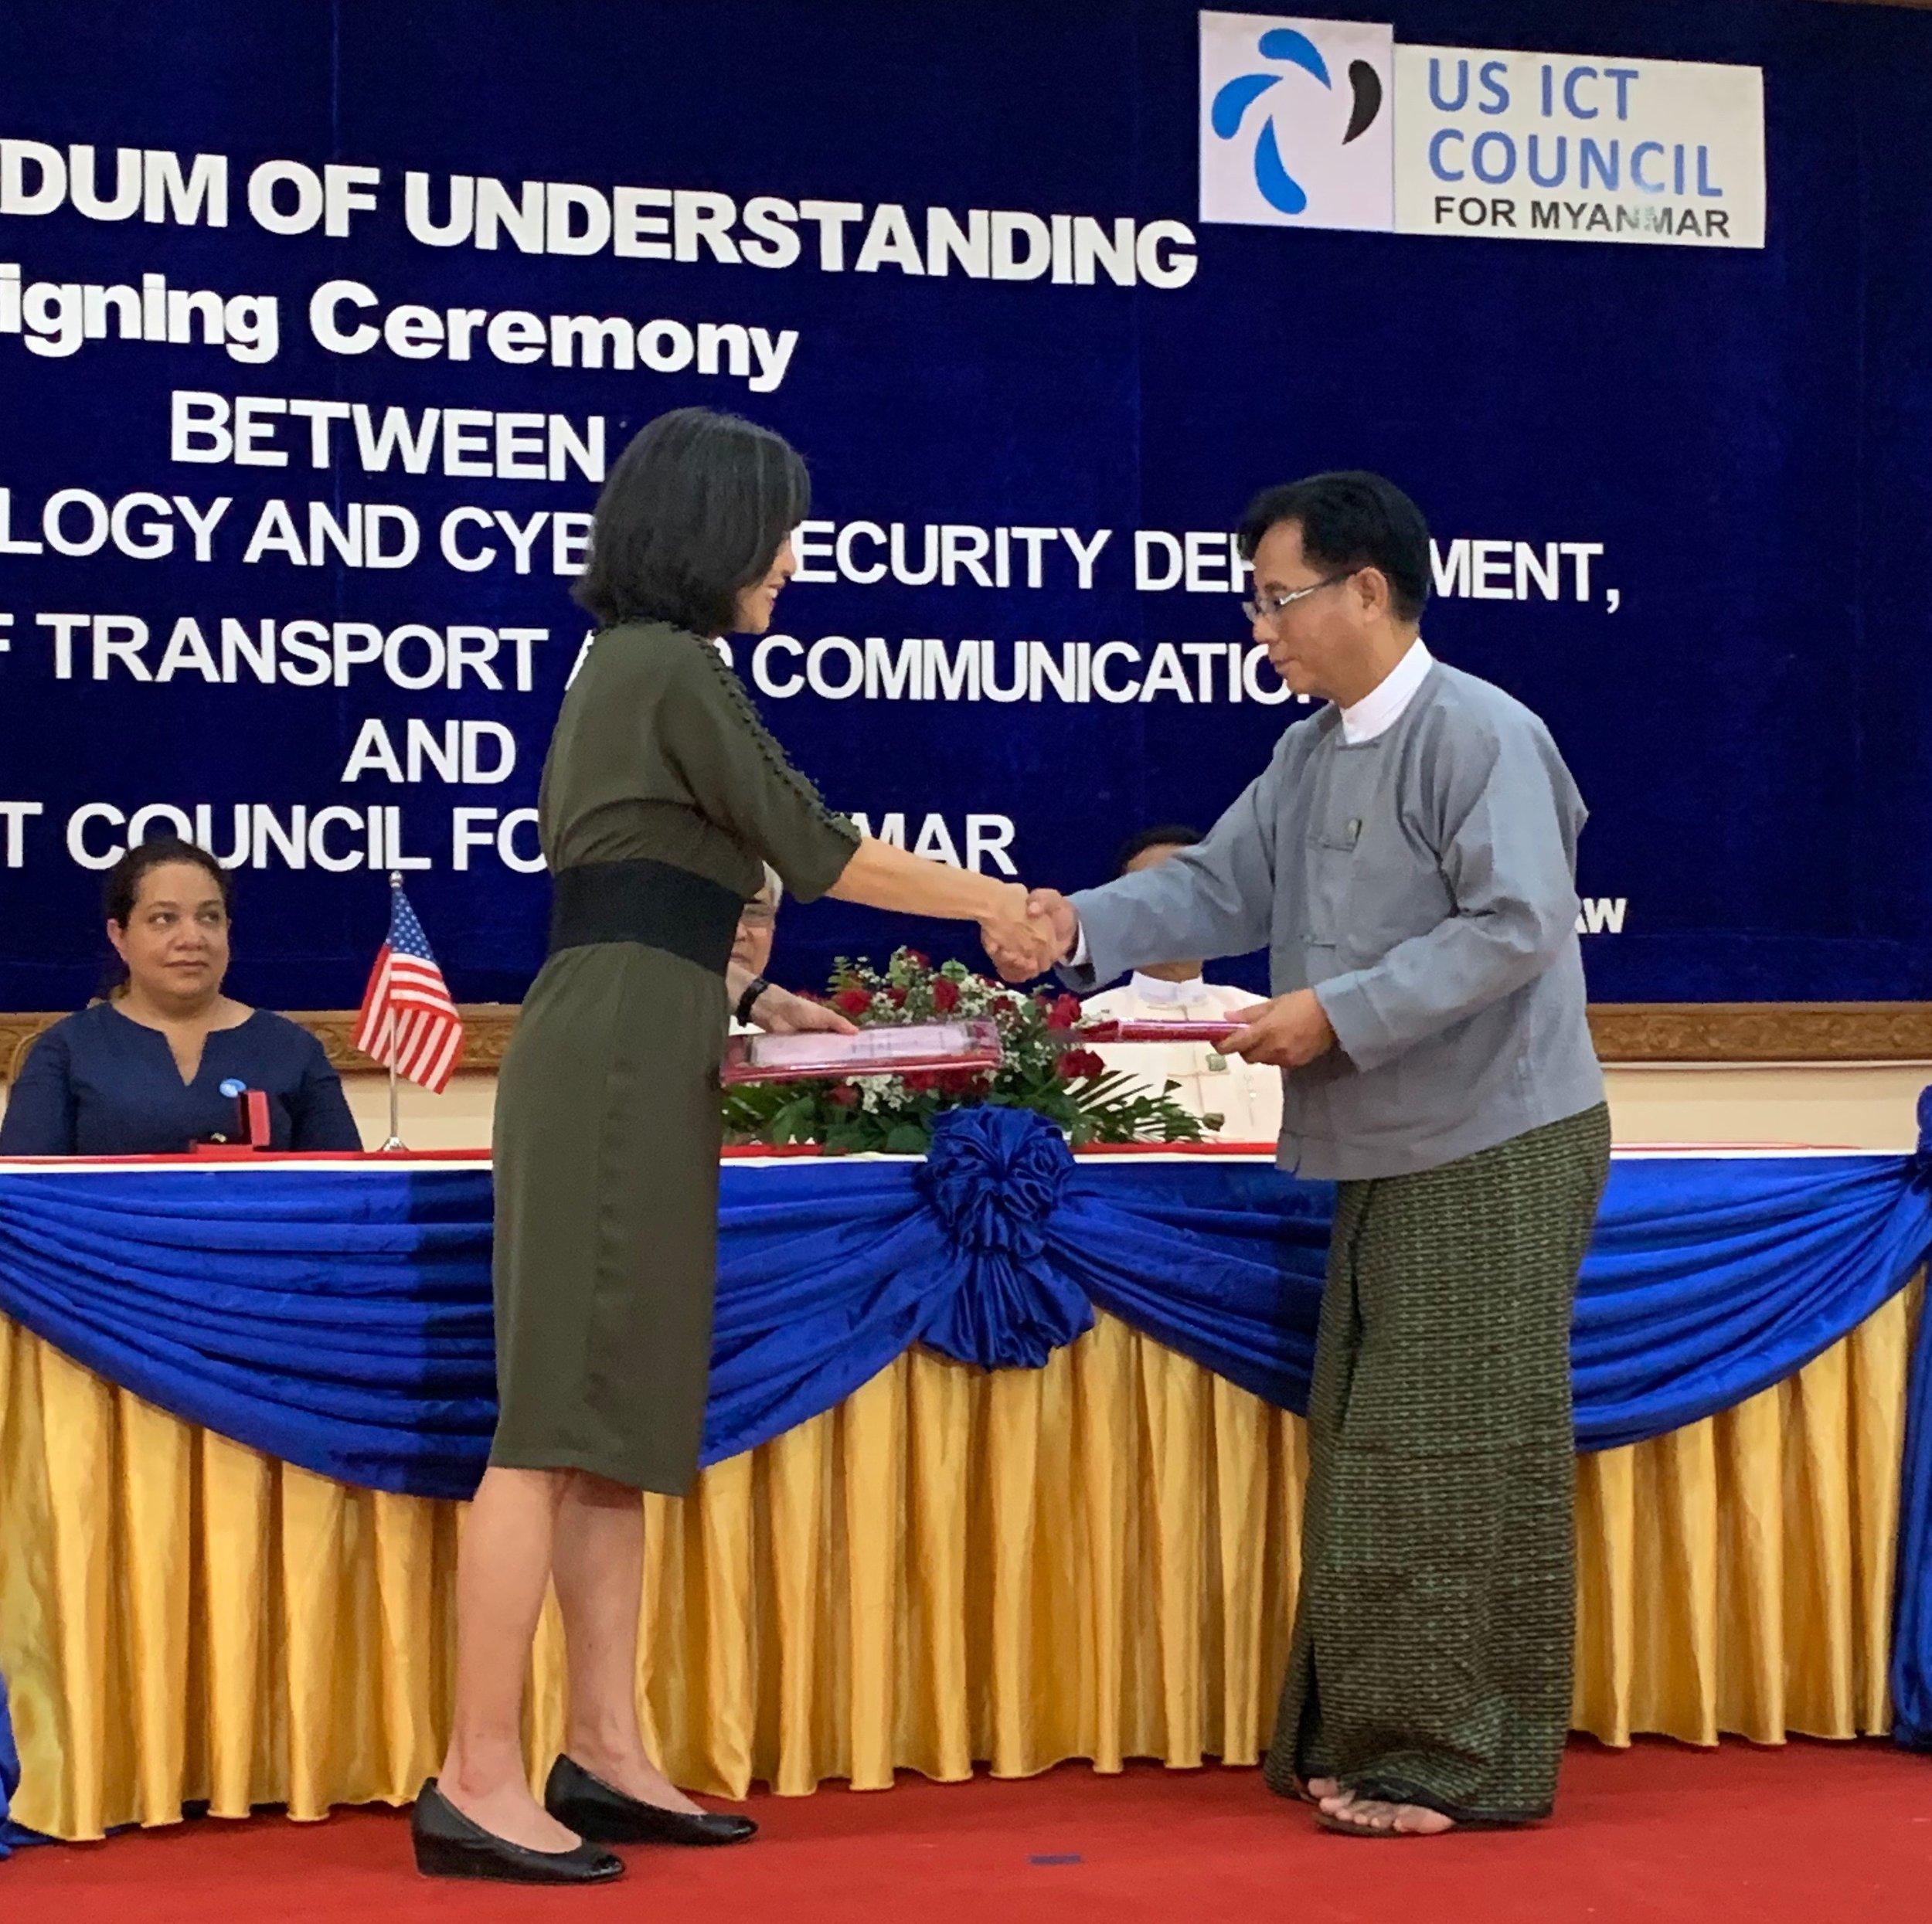 US ICT Council Executive Director Max Shu Teasdale and ITCSD DG U Sai Saw Lin Tun